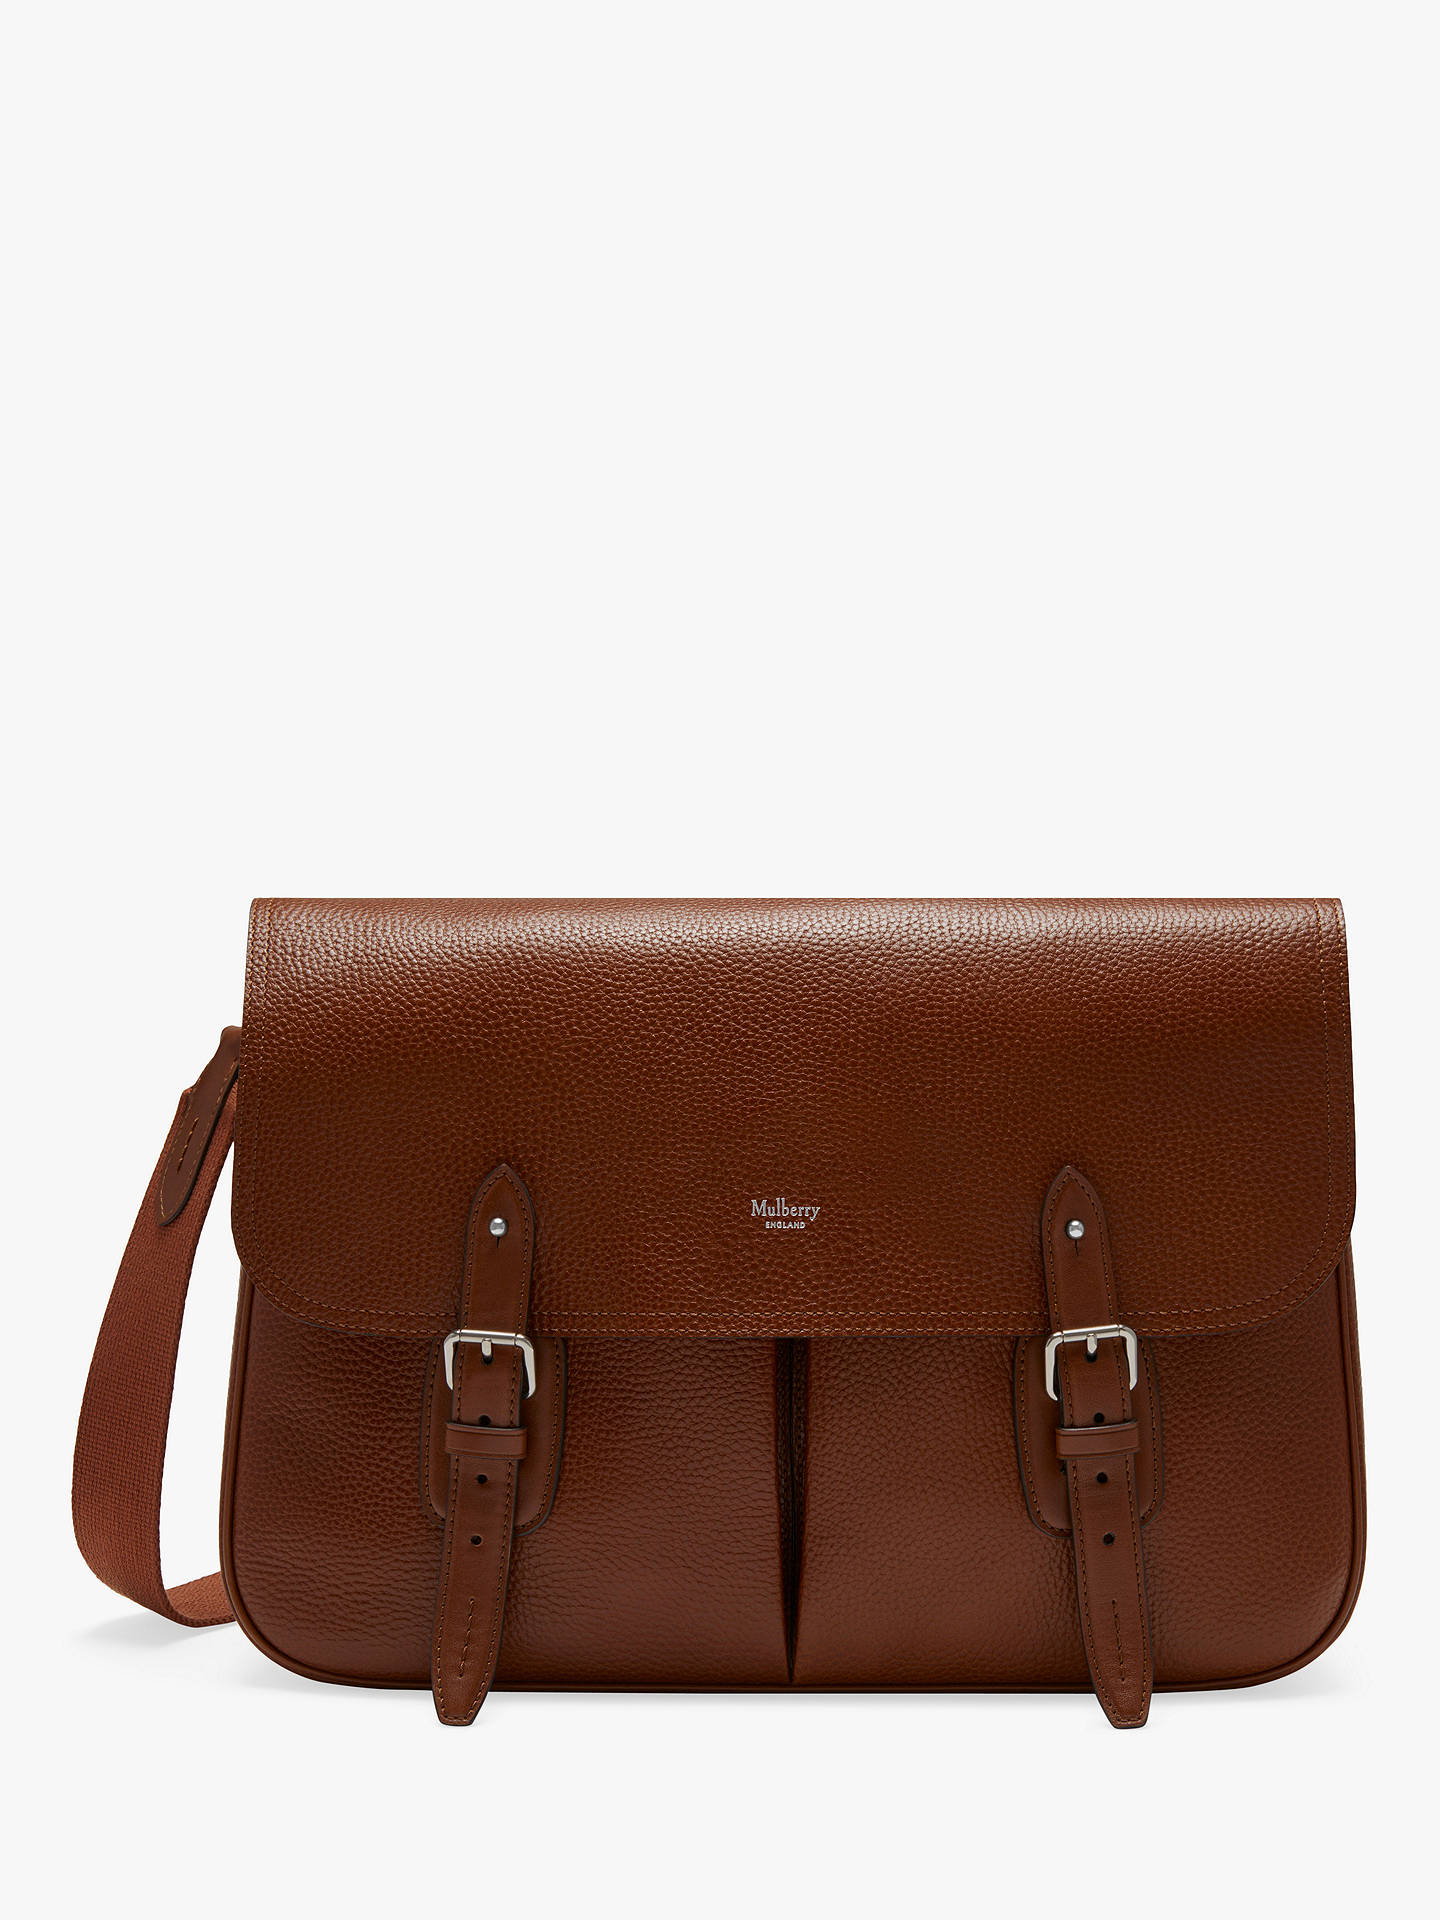 df41cf8ca1 Buy Mulberry Heritage Grain Veg Tanned Leather Messenger Bag